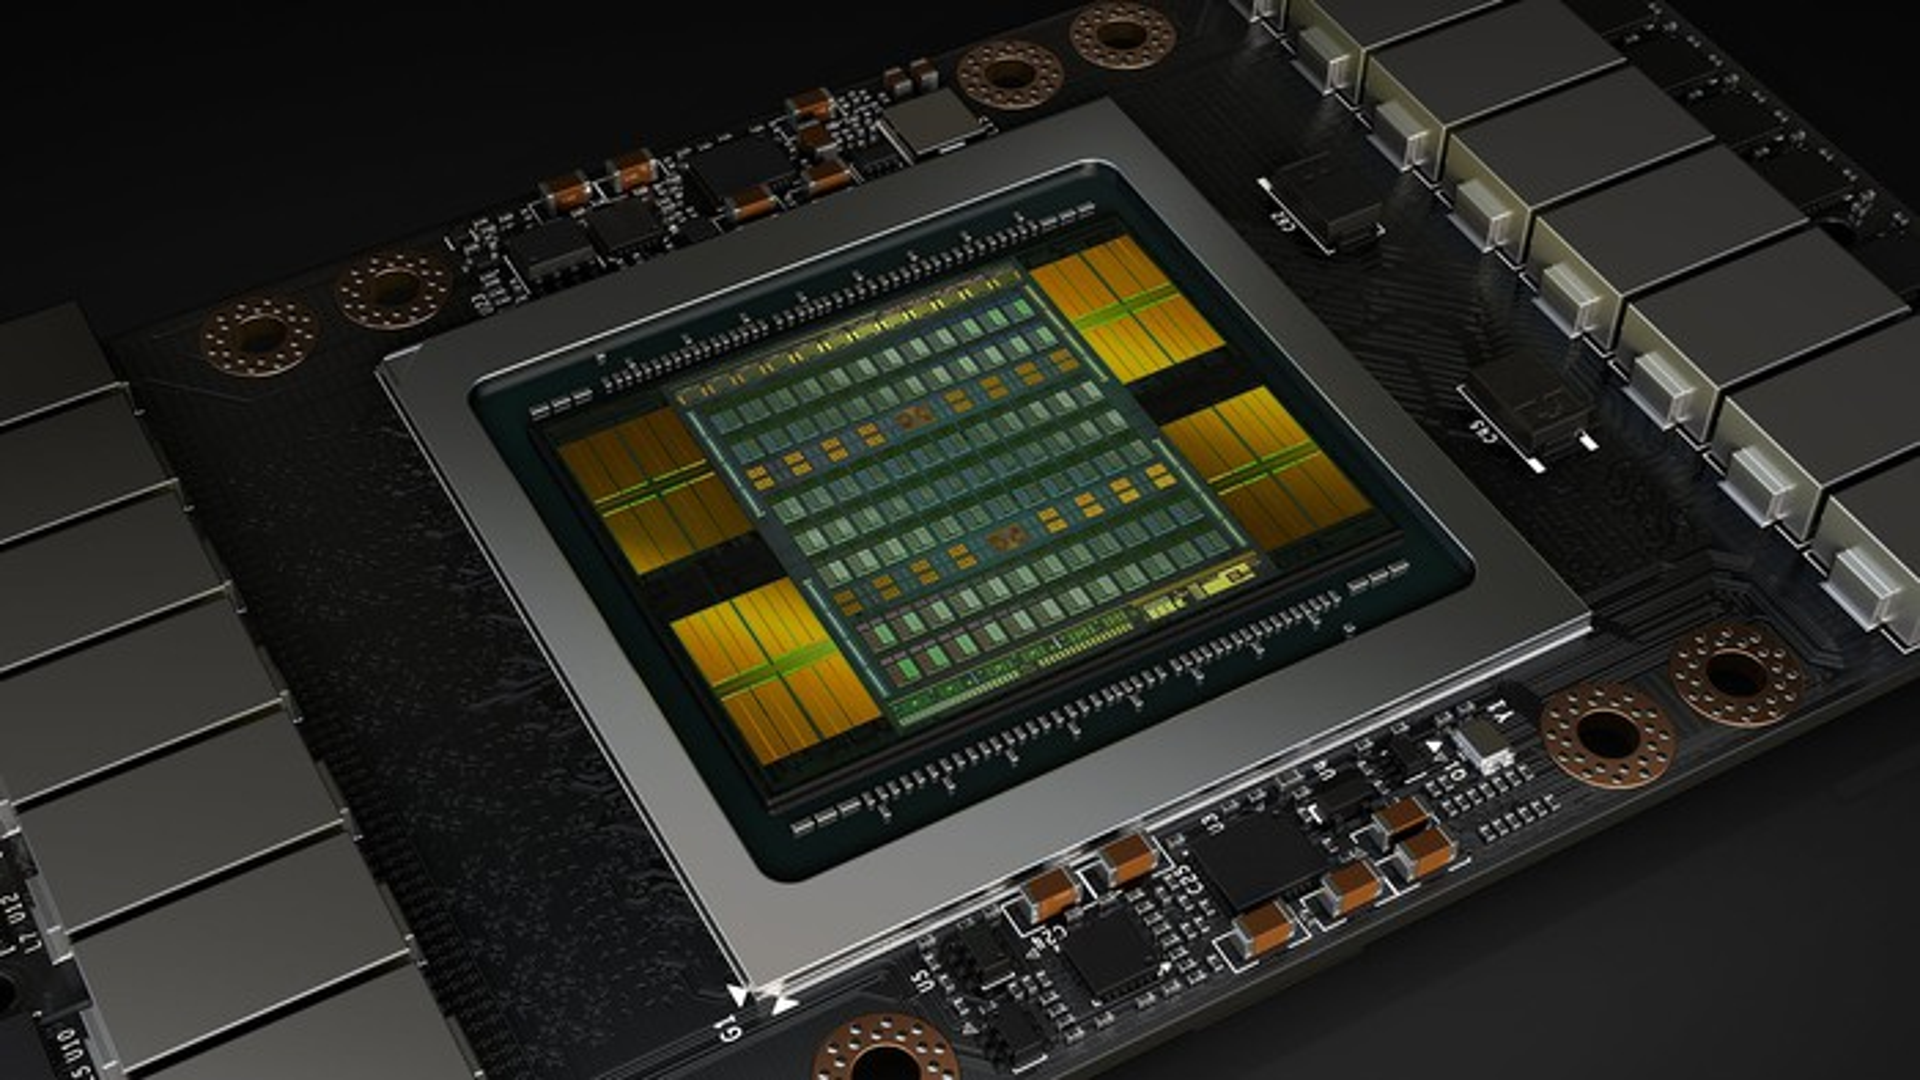 NVIDIA Tesla V100 graphics processor